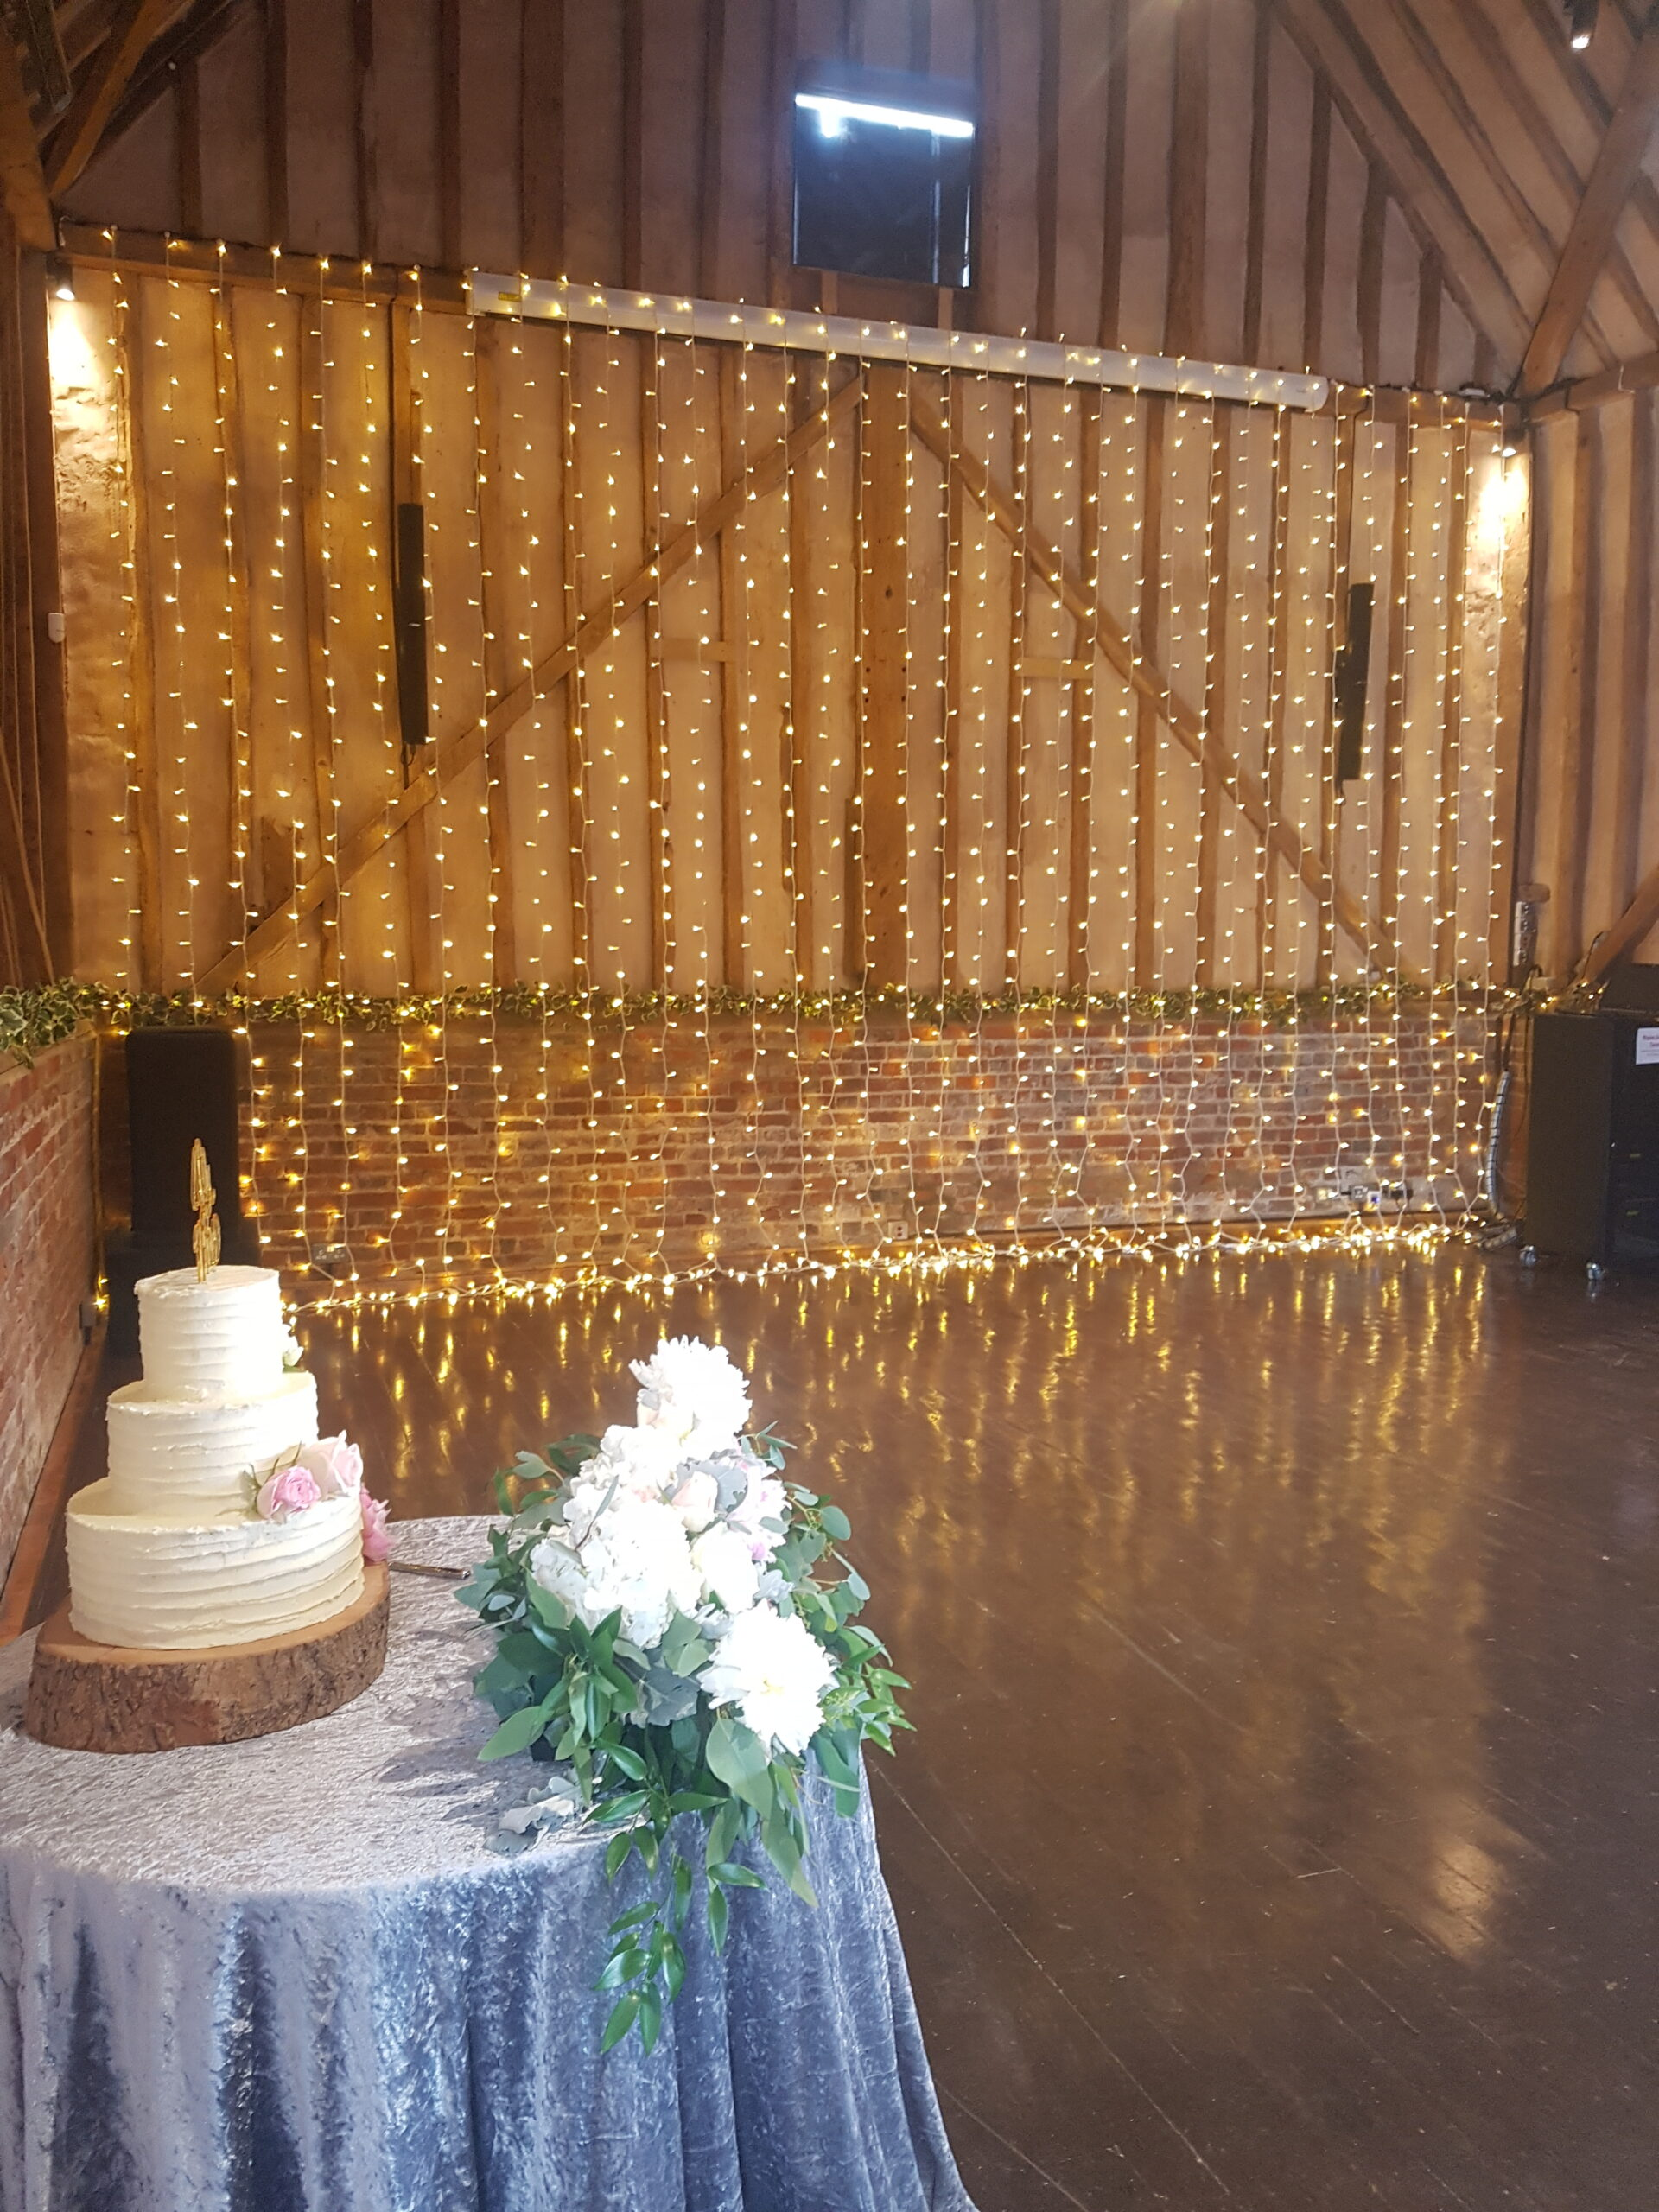 Wedding backdrop of lights.